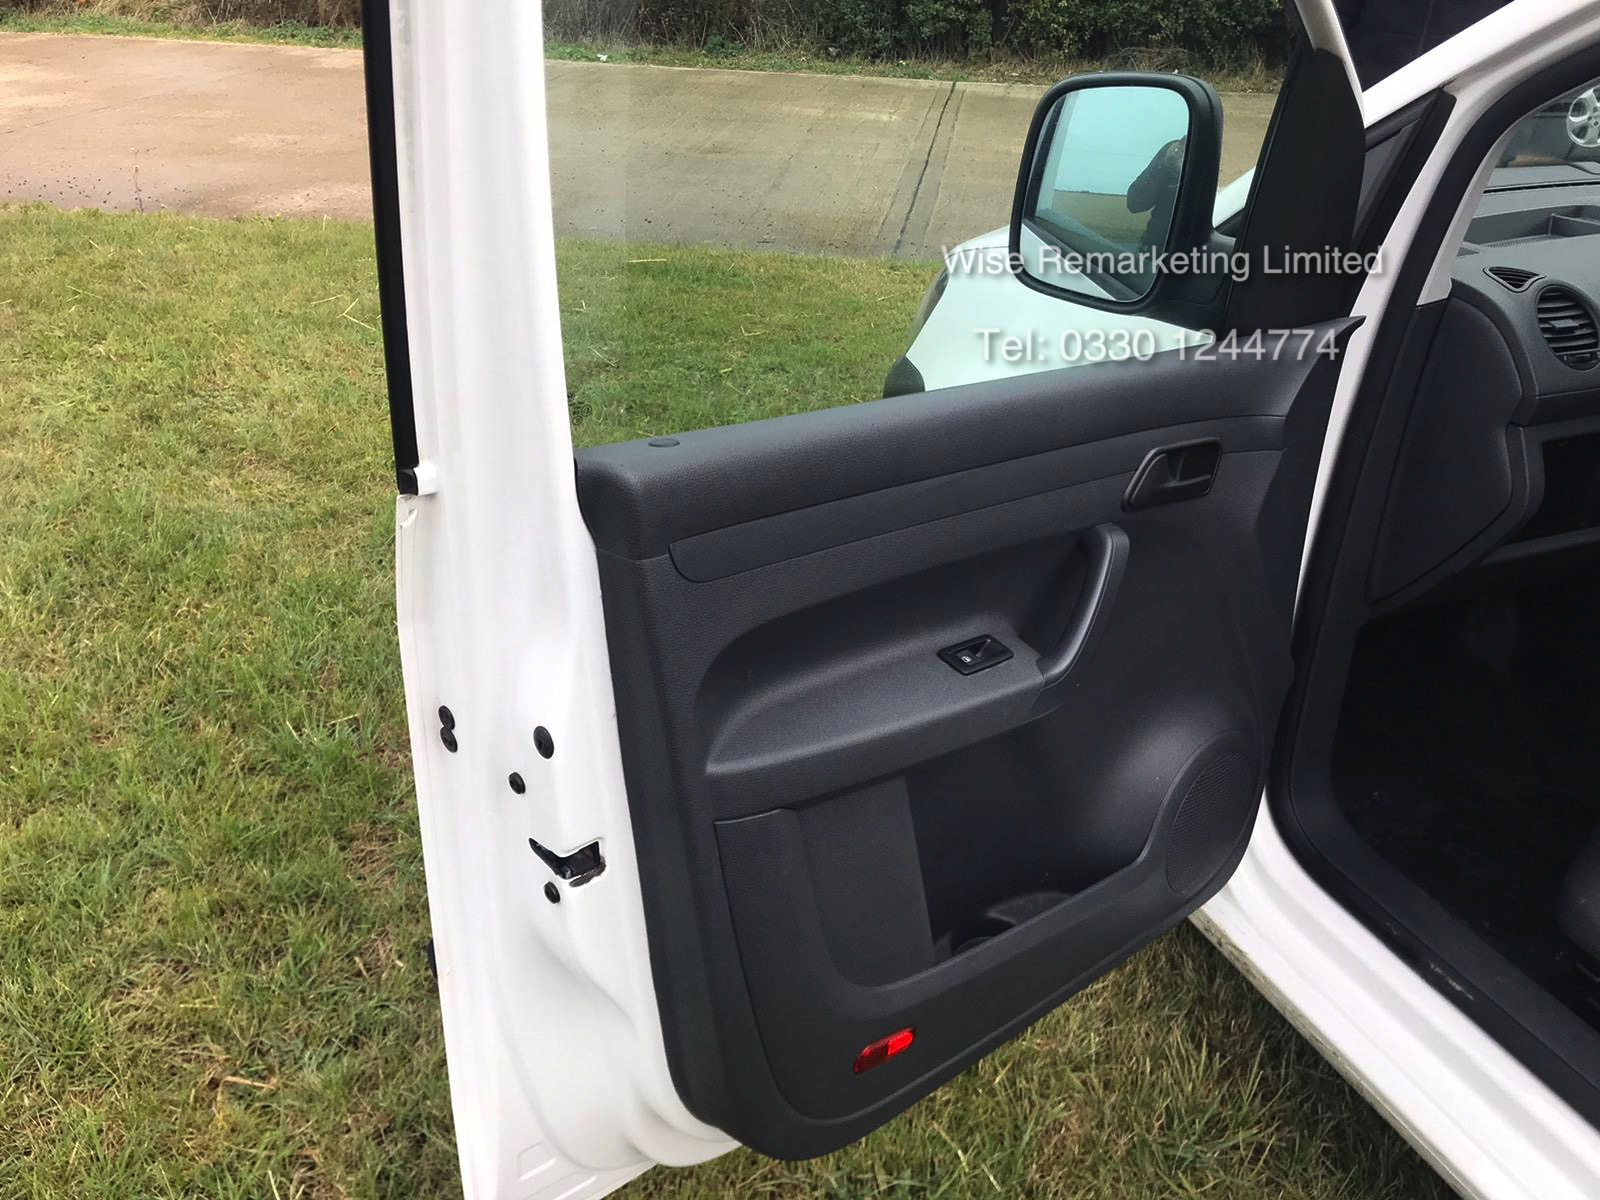 Volkswagen Caddy C20 + Startline 1.6 Tdi - 2014 Model - White - Side Loading Door - Ply Lined - Image 9 of 13